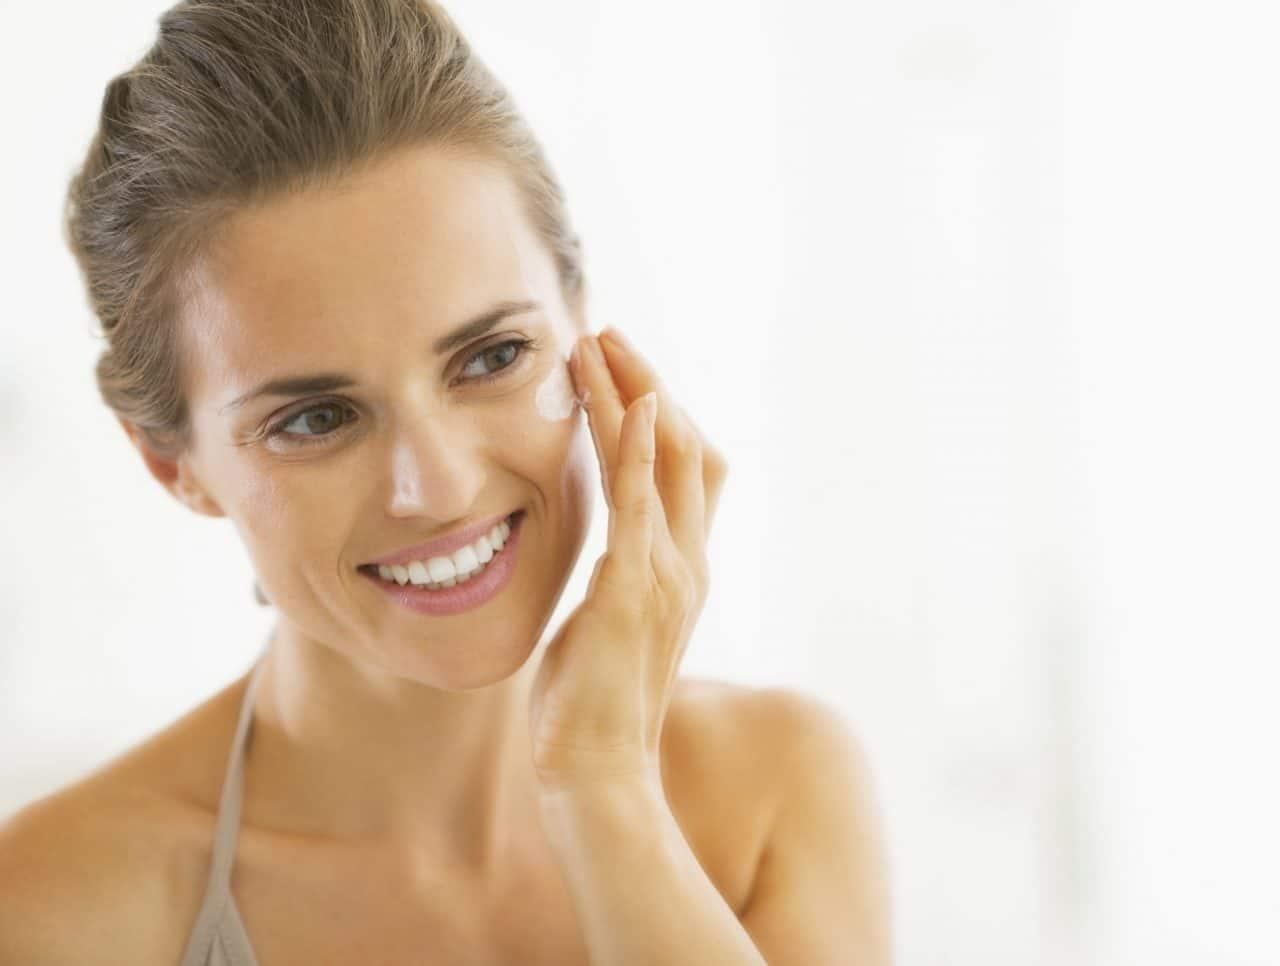 Person applying a cream on their cheek